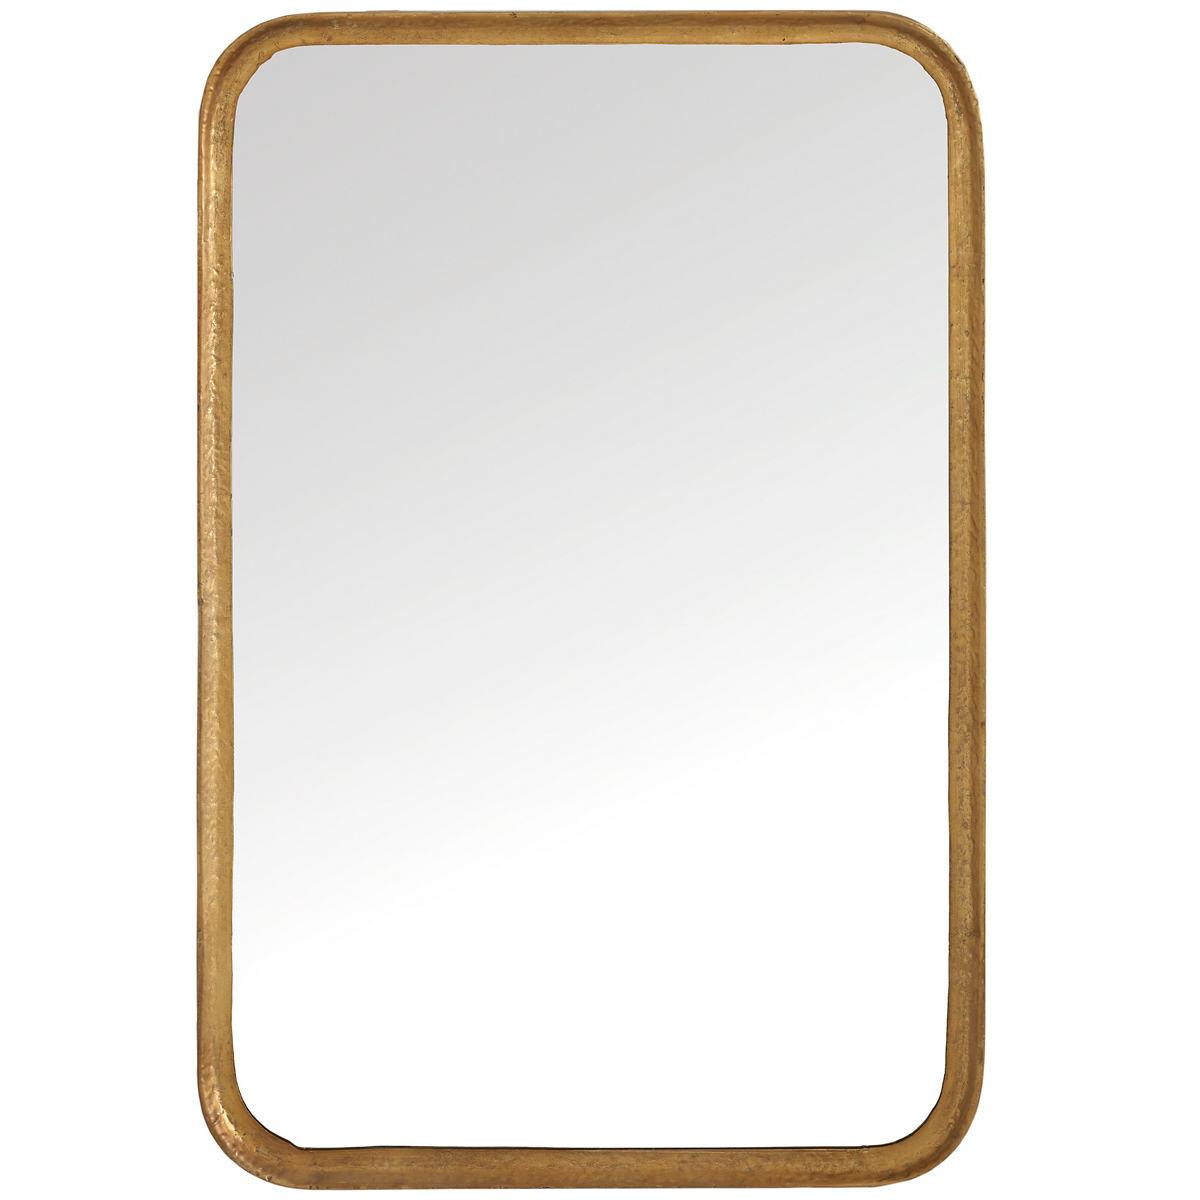 Benton Gold Mirror